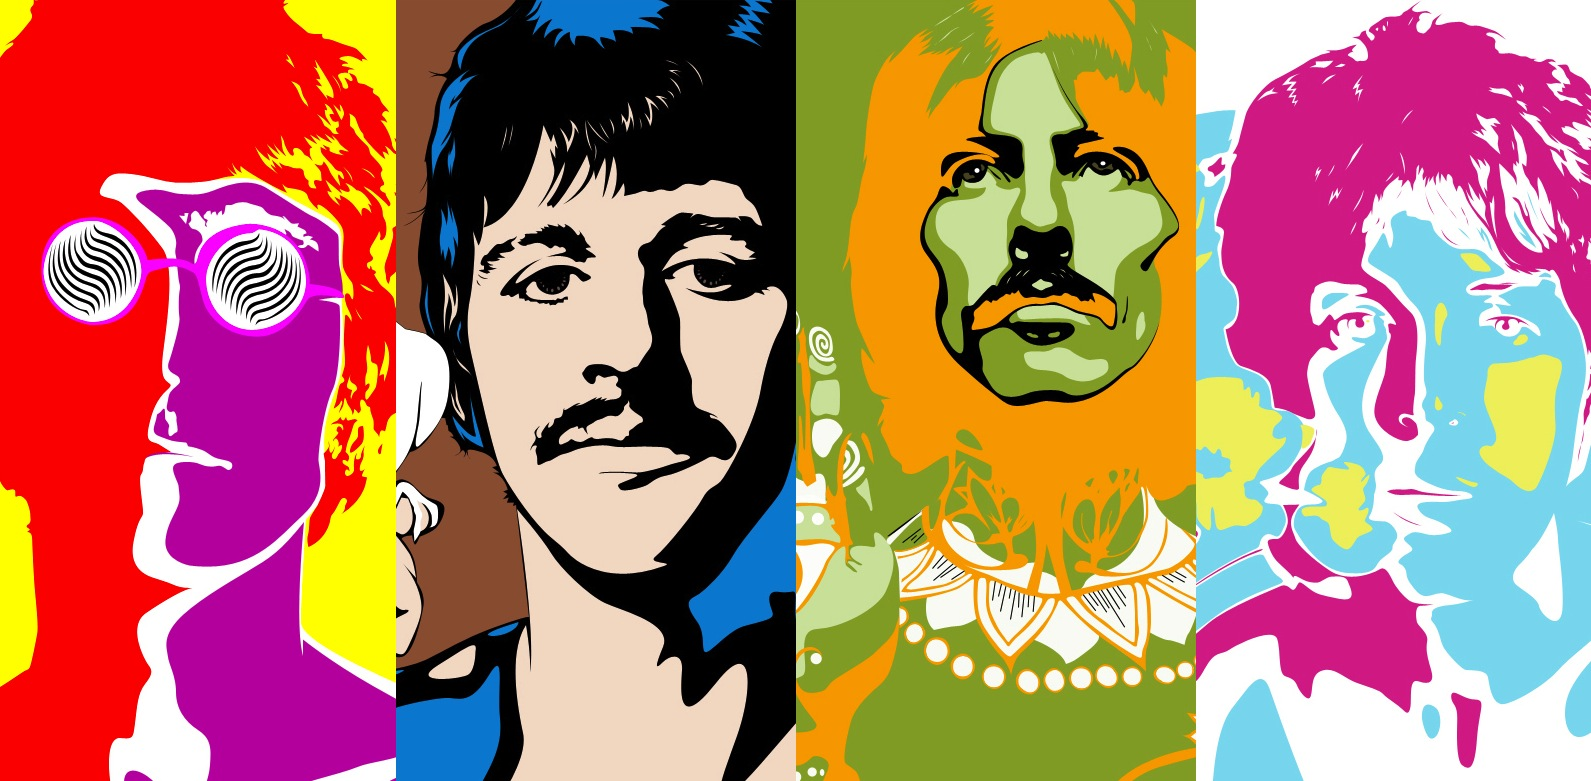 Los Beatles: arte submarino amarillo